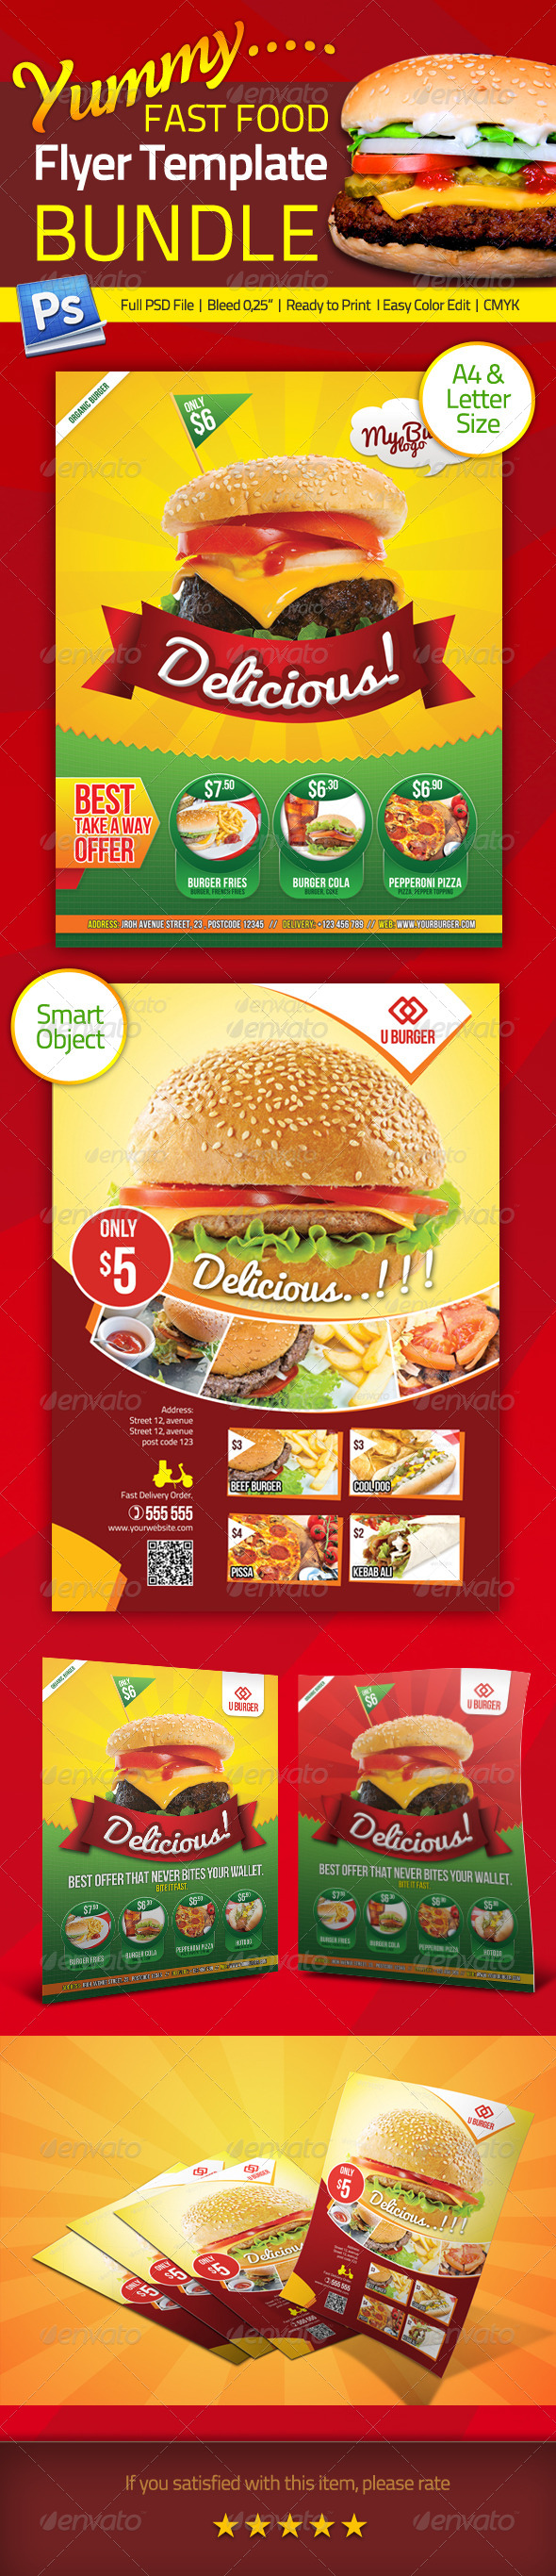 Bundle Fastfood Flyer Template